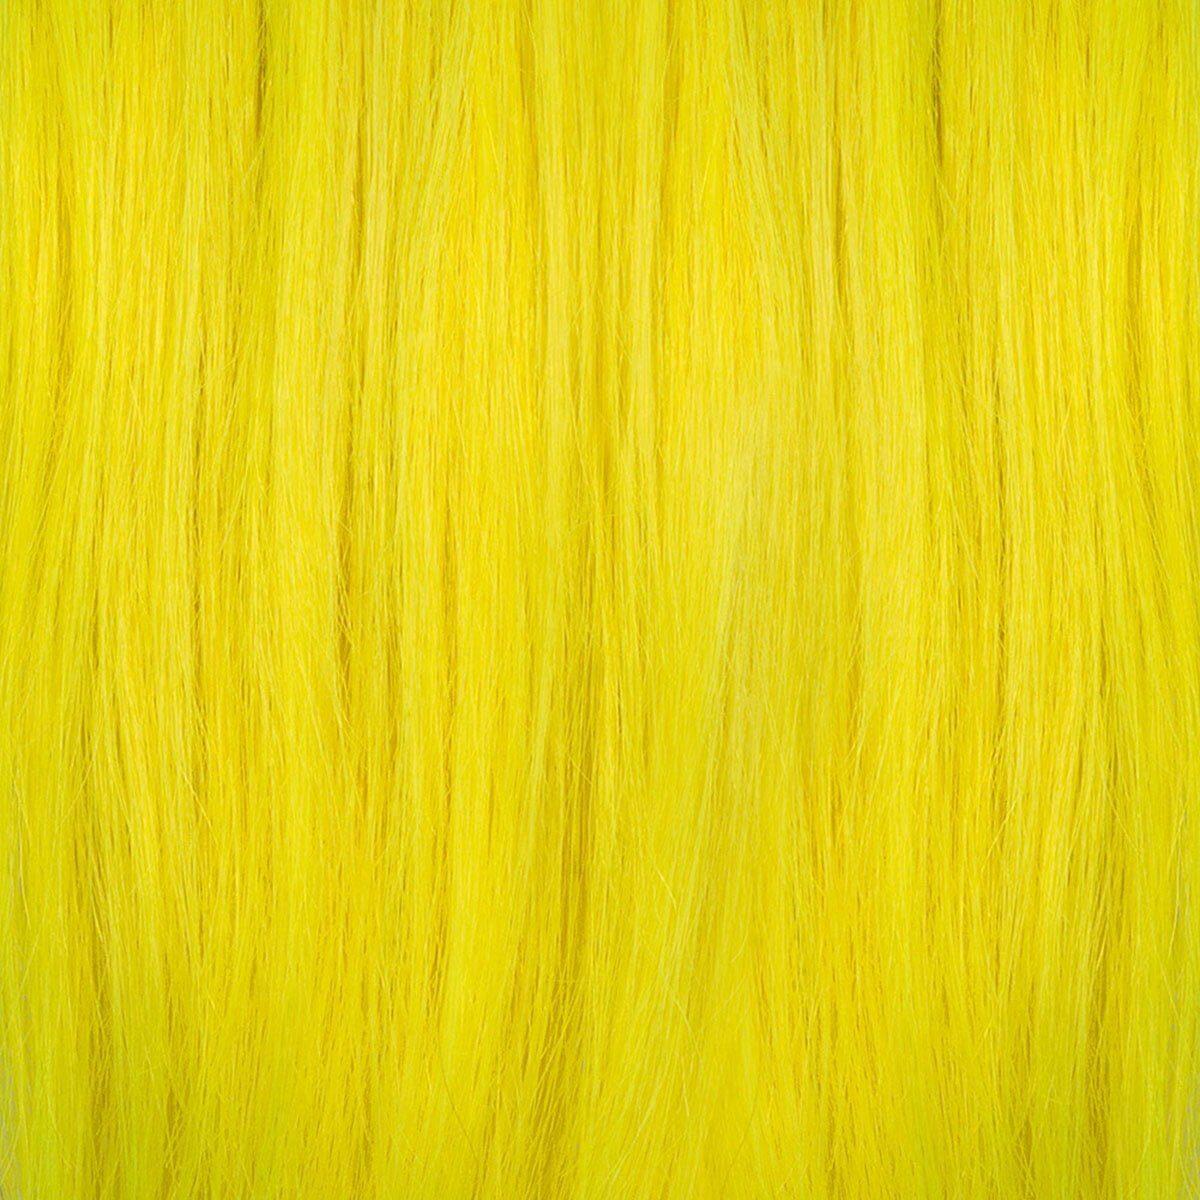 manic panic high voltage gul uv hårfarge 118 ml electric banana classic swatch 36985